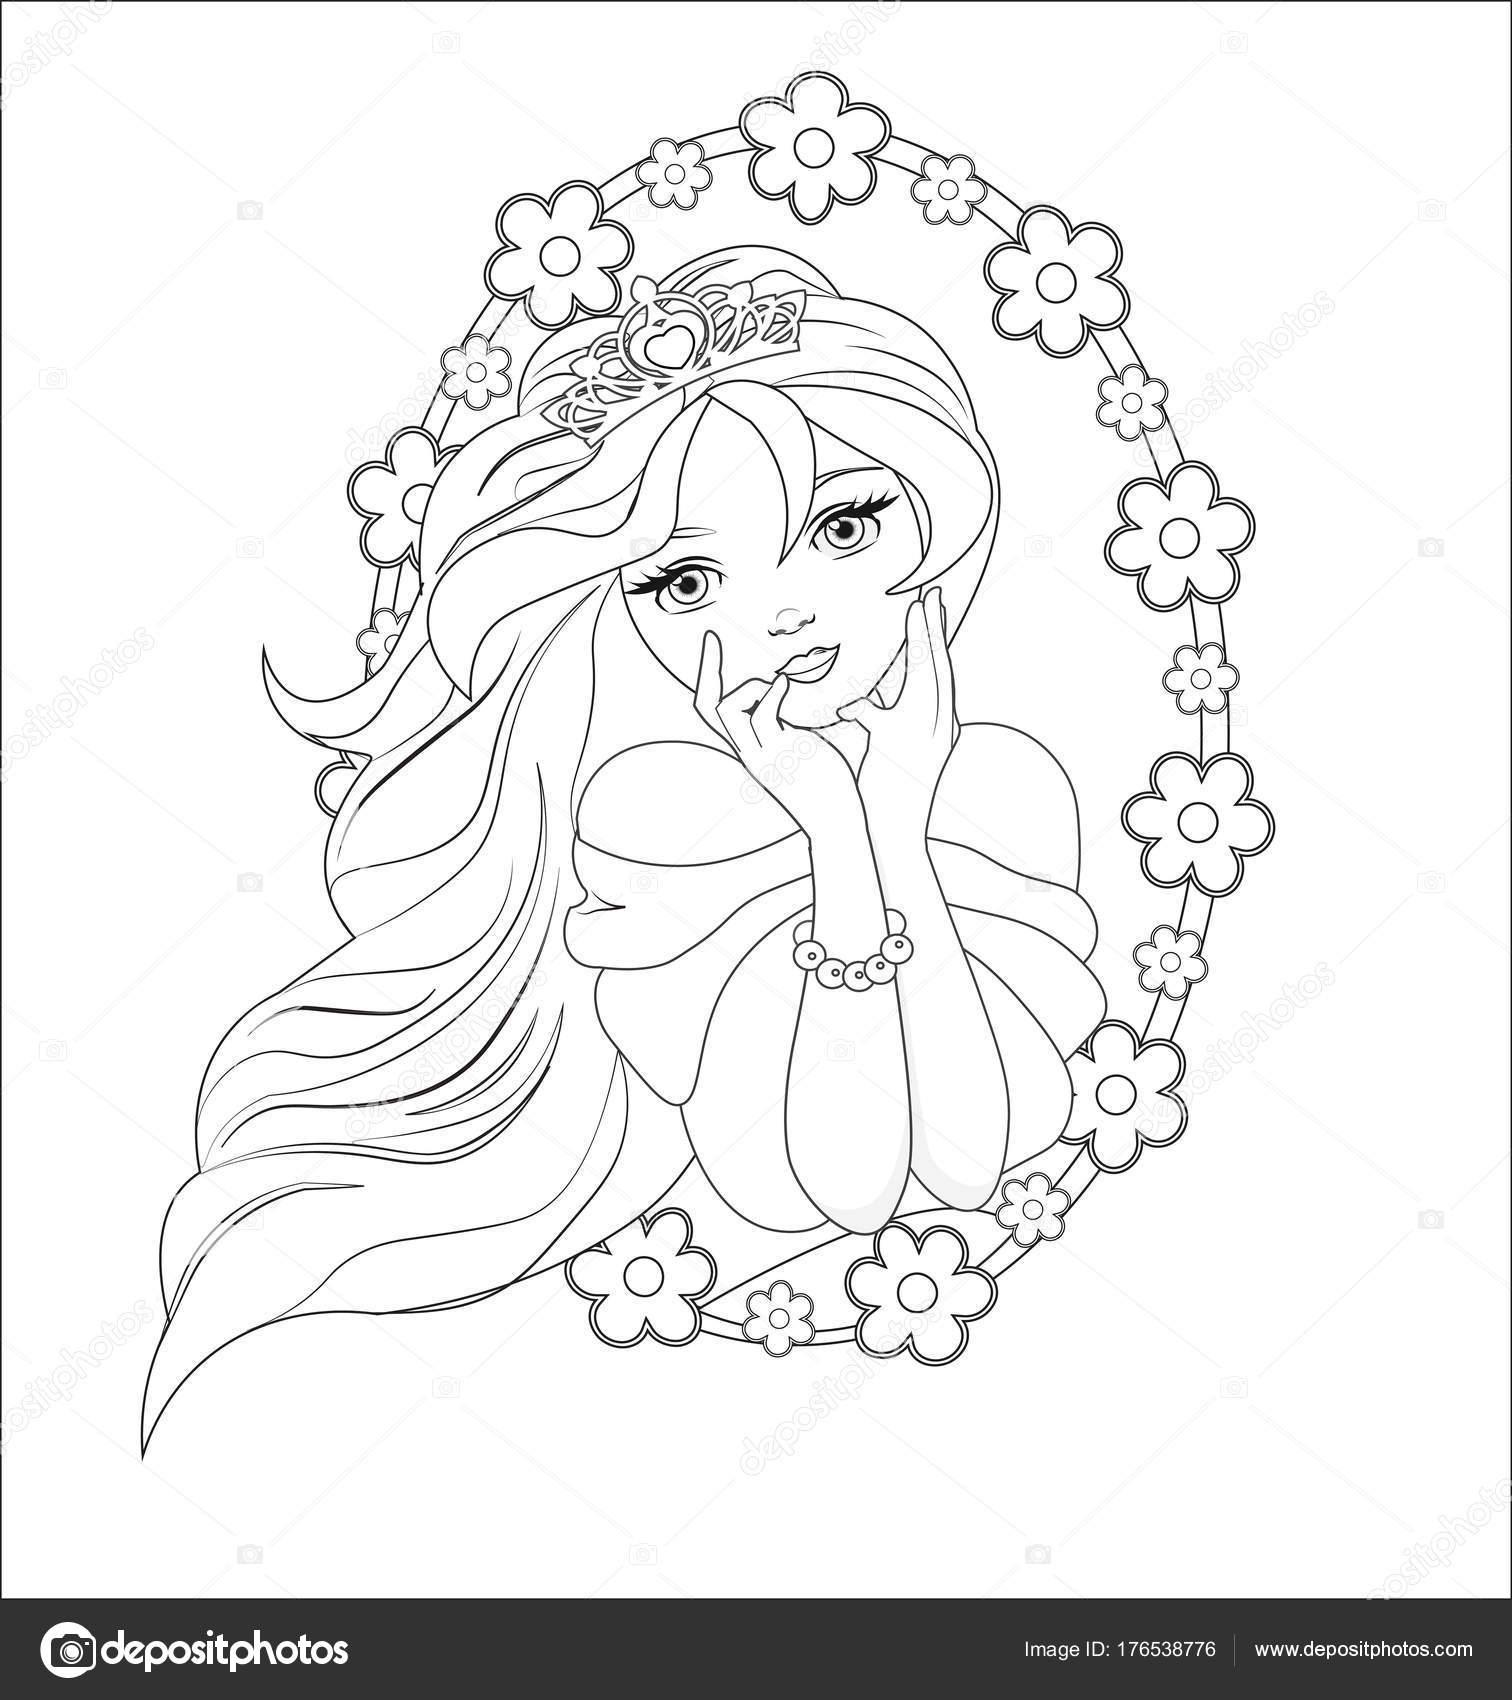 Kleurplaten Prinsessen Assepoester.Prinses Dromen Kleurplaten Stockvector C Lollitta 176538776